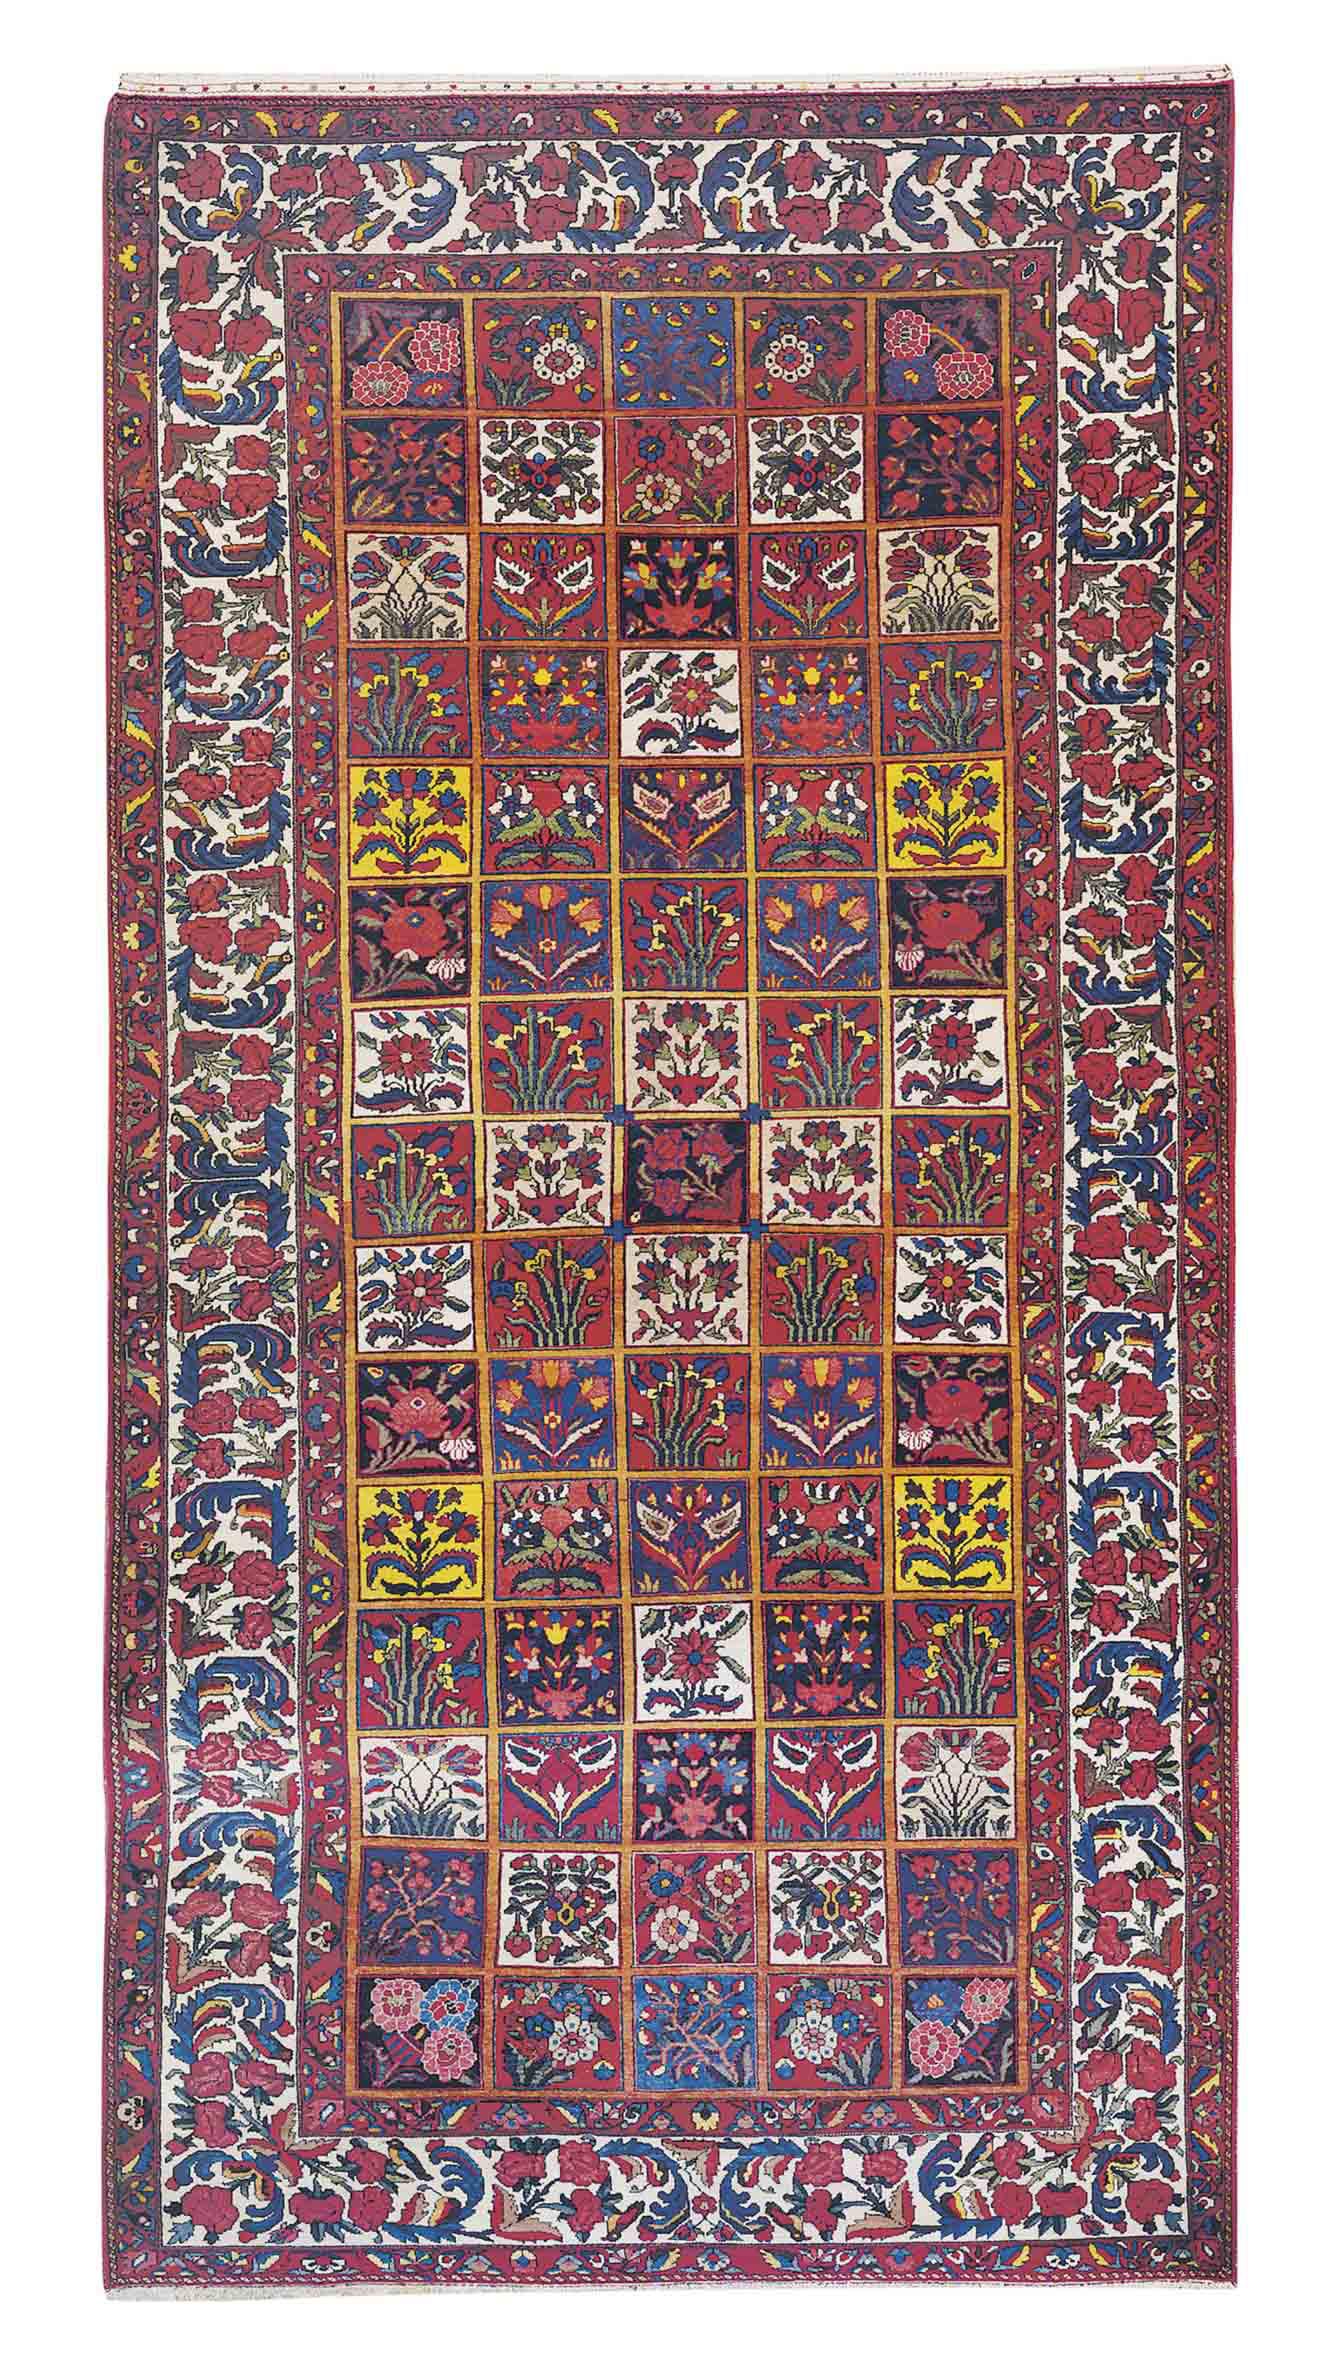 A fine Bakhtiari carpet